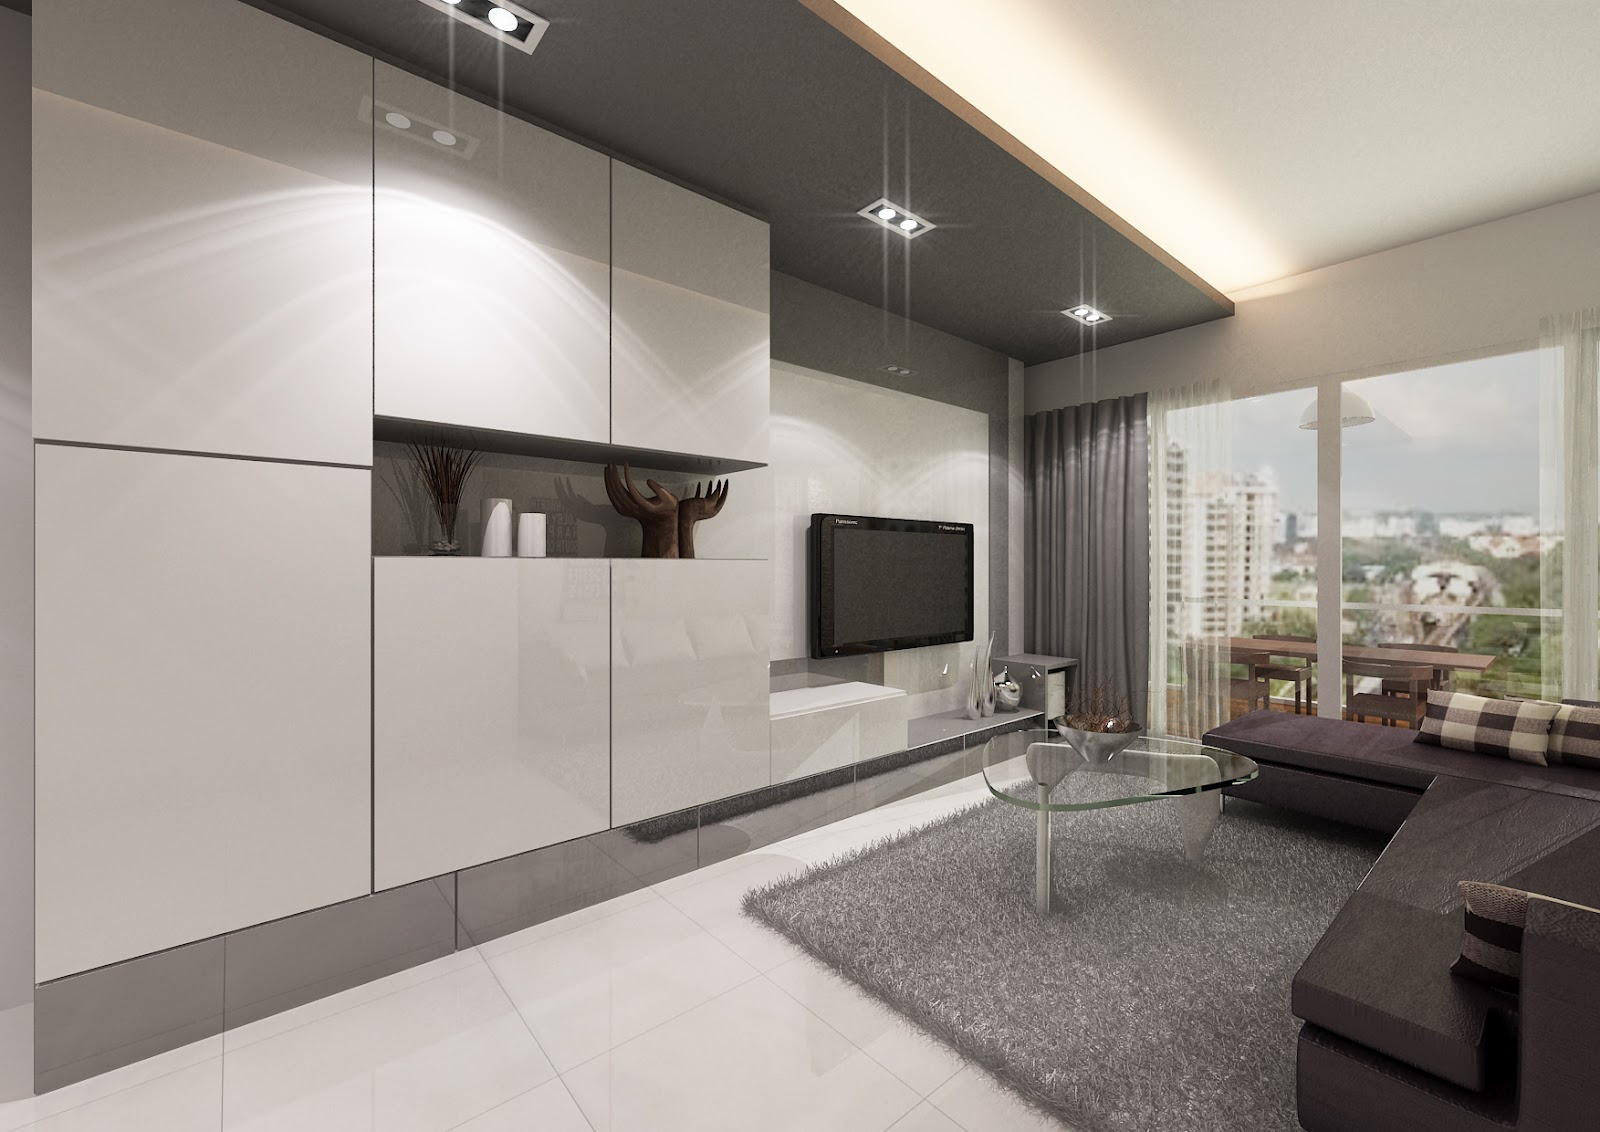 Rezt Amp Relax Interior Design Double Bay Residences 3d